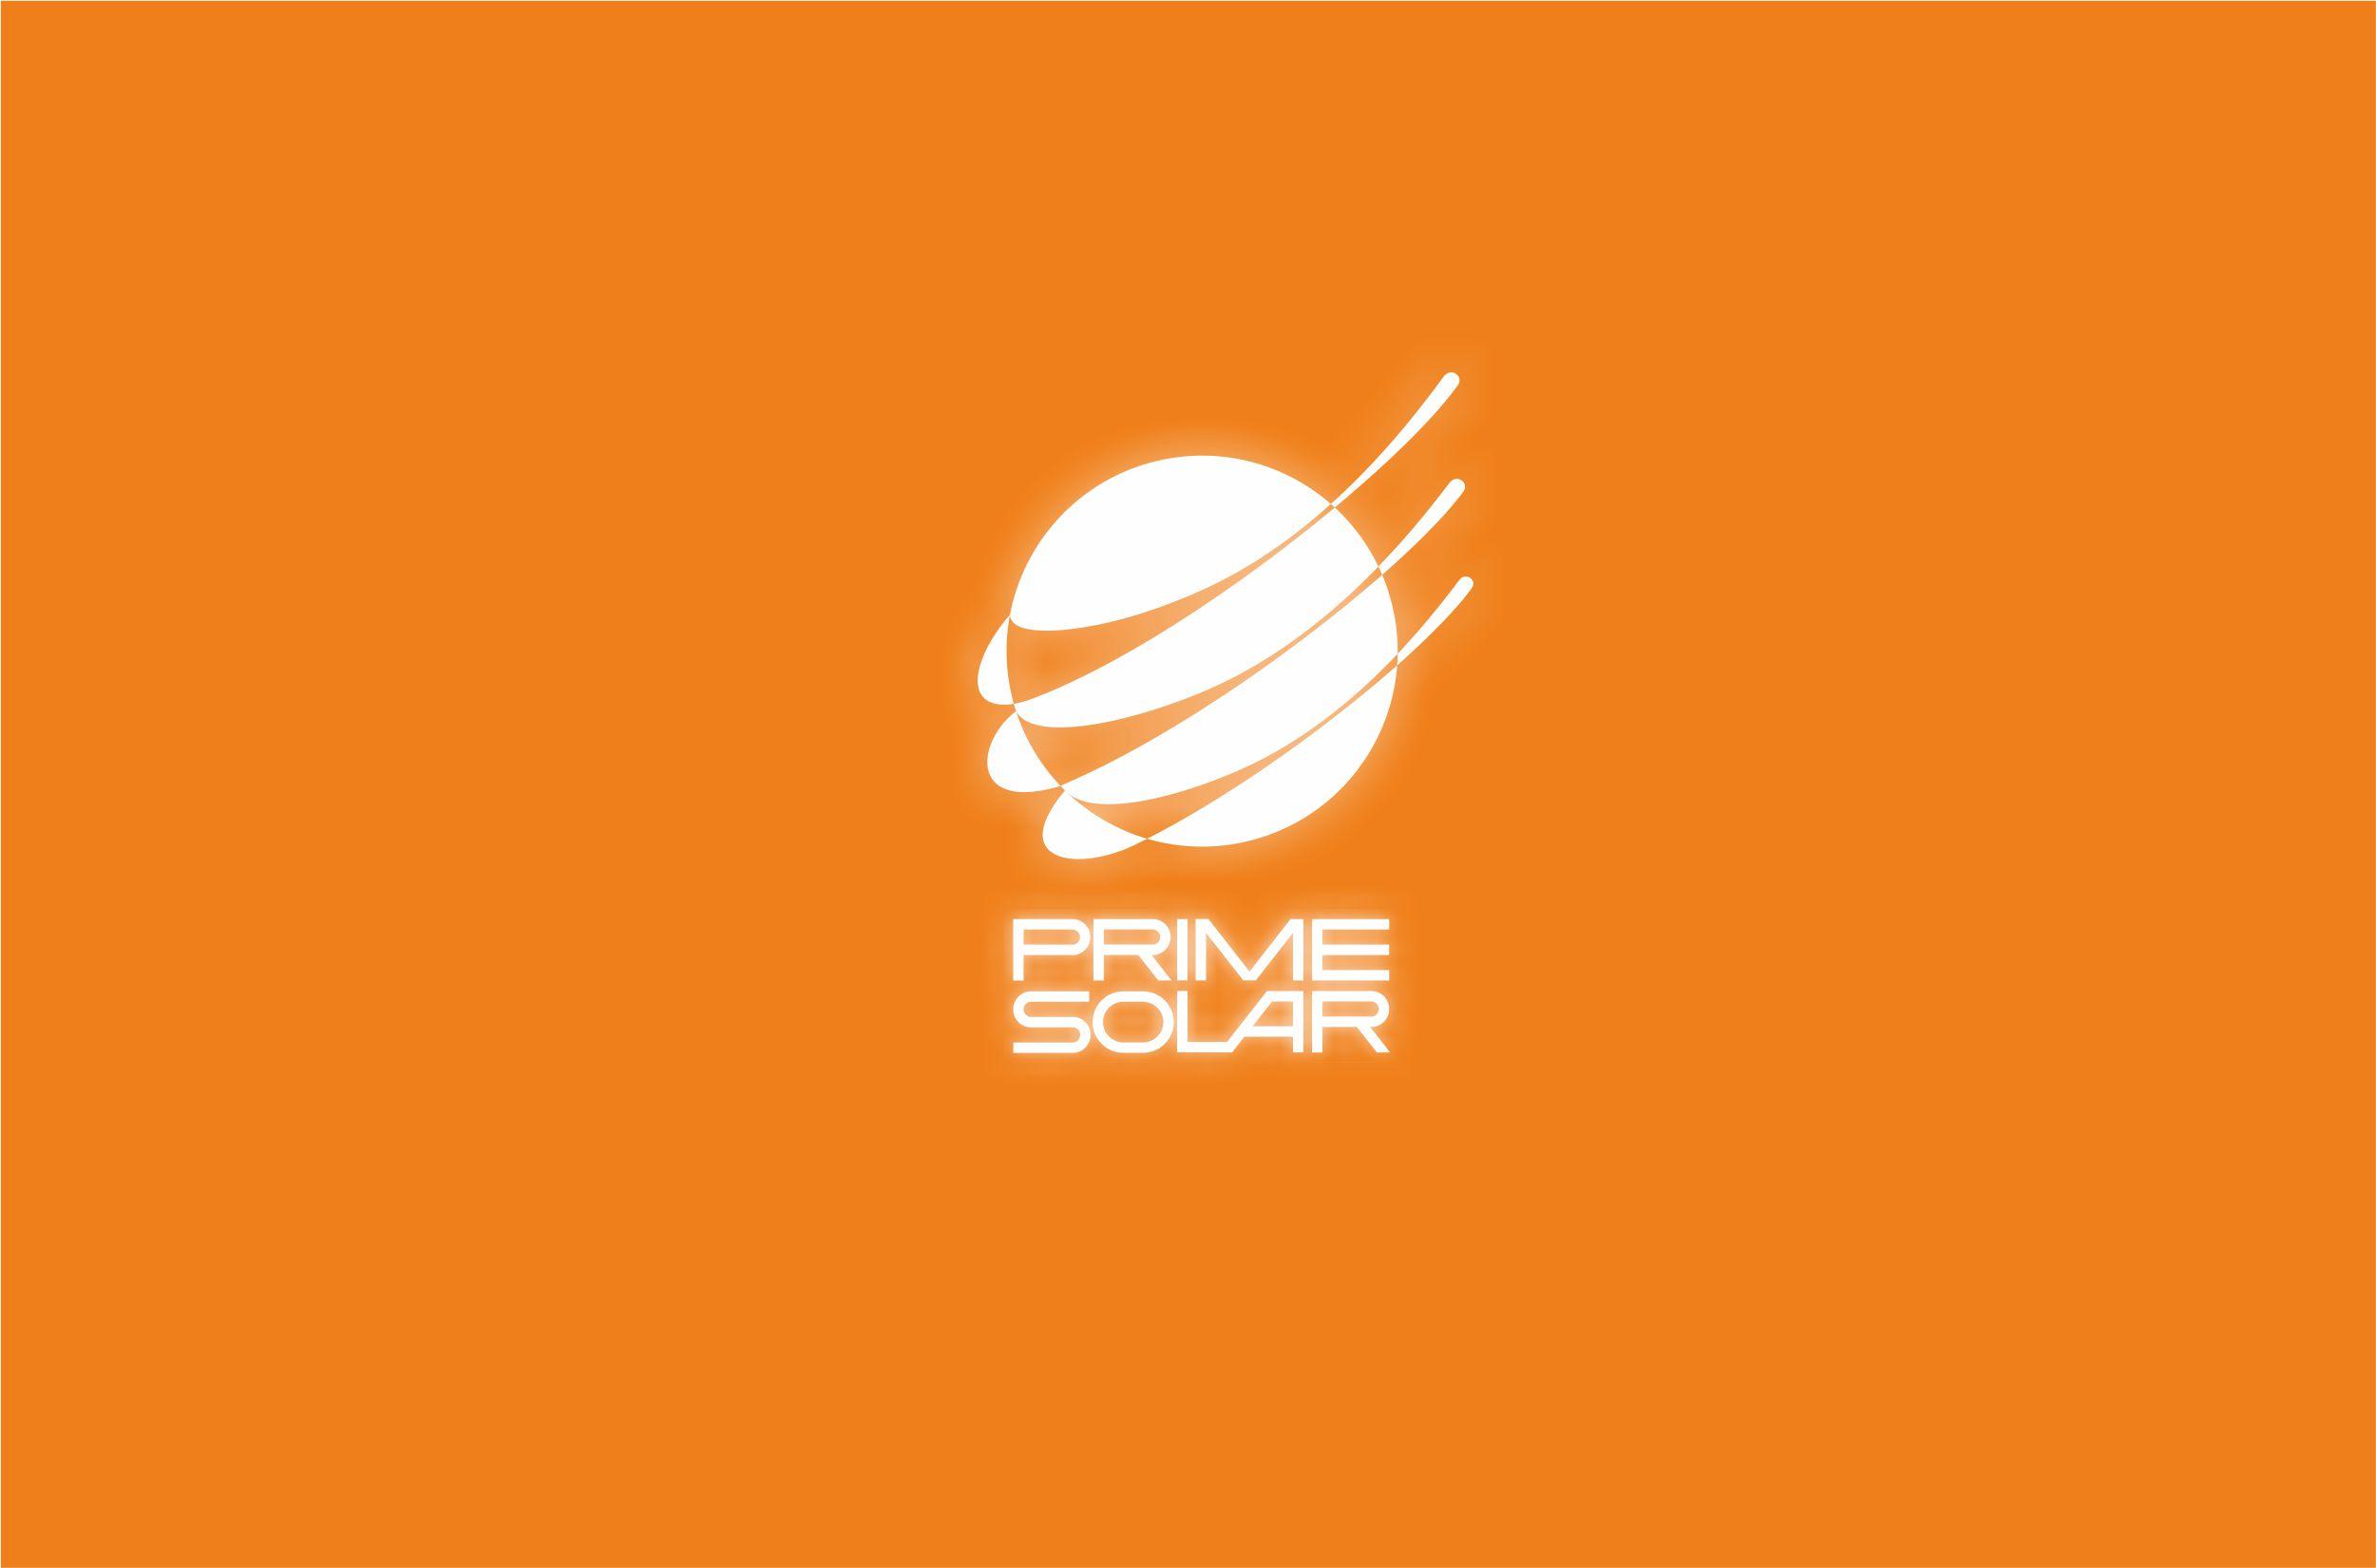 Логотип компании PrimeSolar [UPD: 16:45 15/12/11] фото f_4f03c05fadd51.jpg